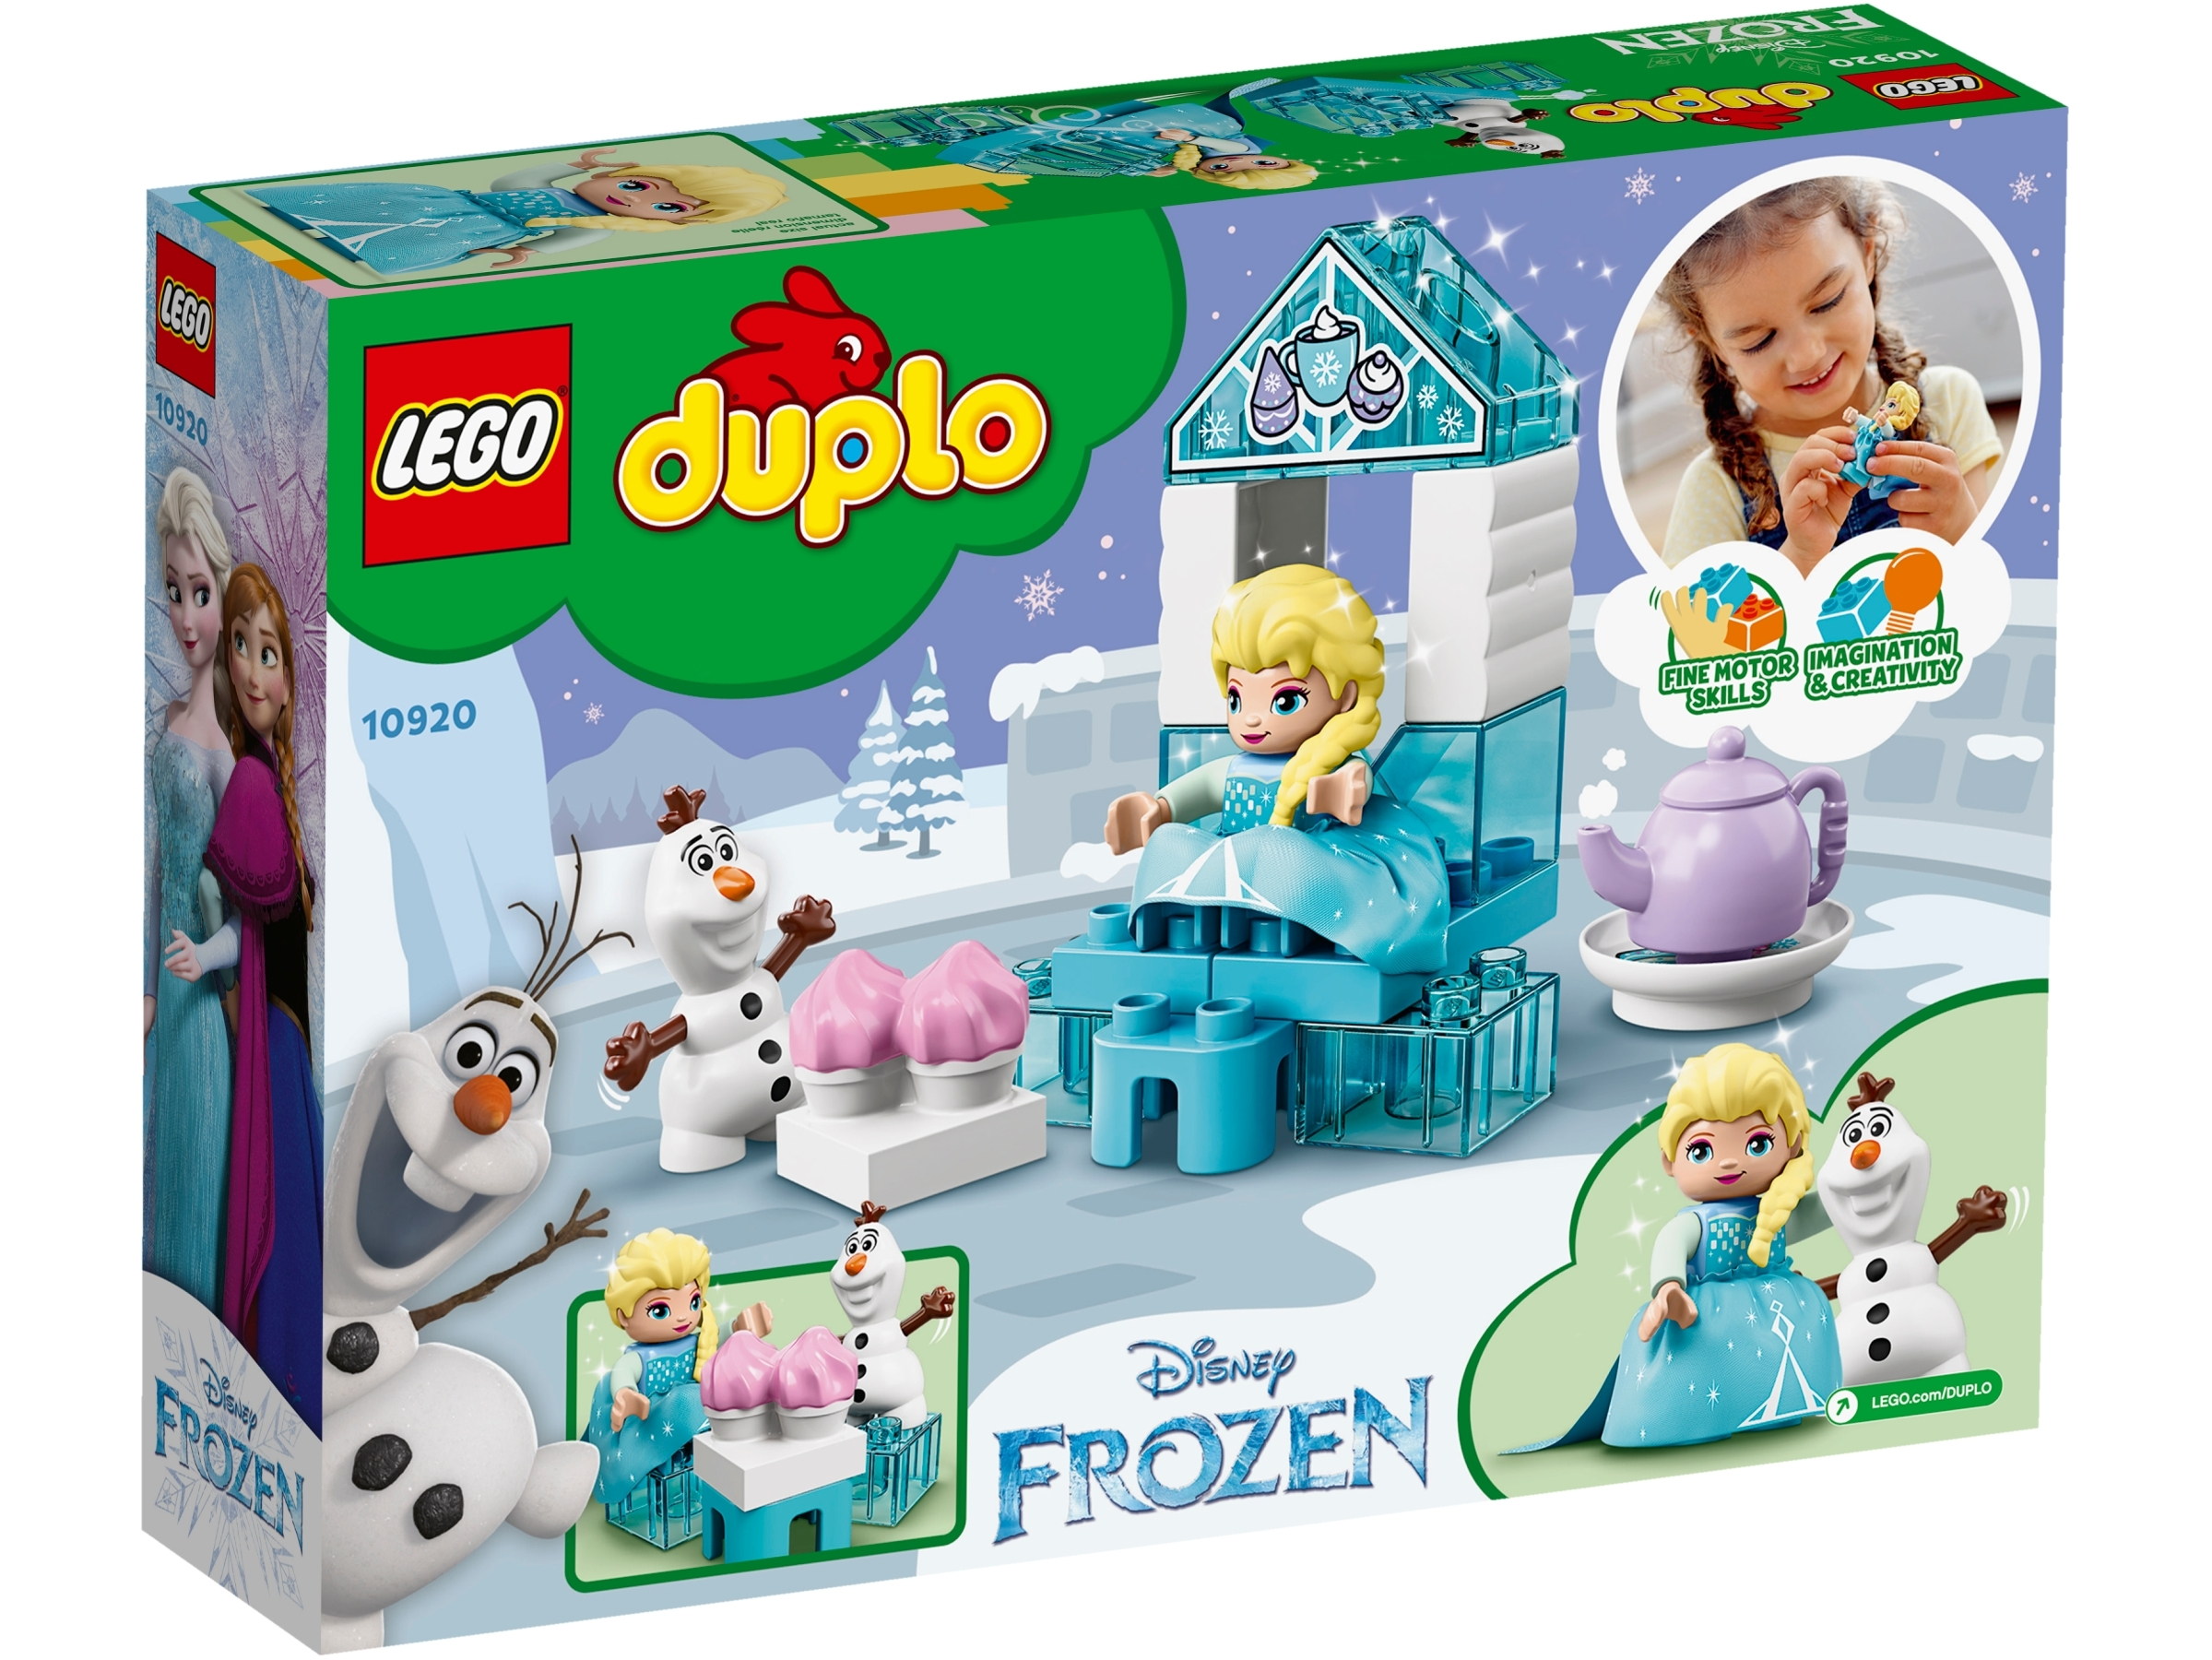 LEGO DUPLO FROZEN 10920